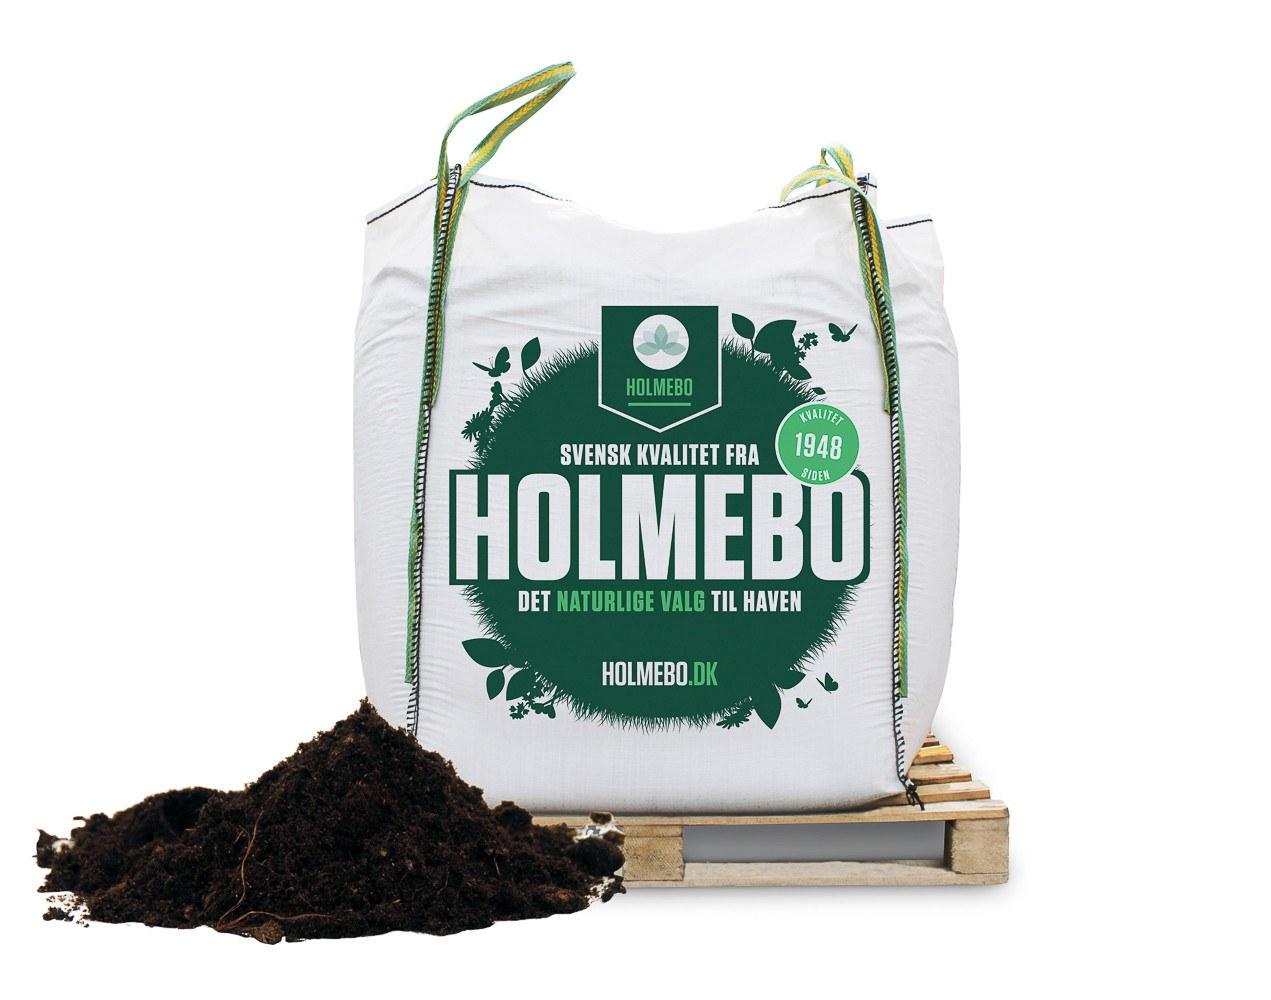 Holmebo Drivhusmuld -  Bigbag á 1000 liter